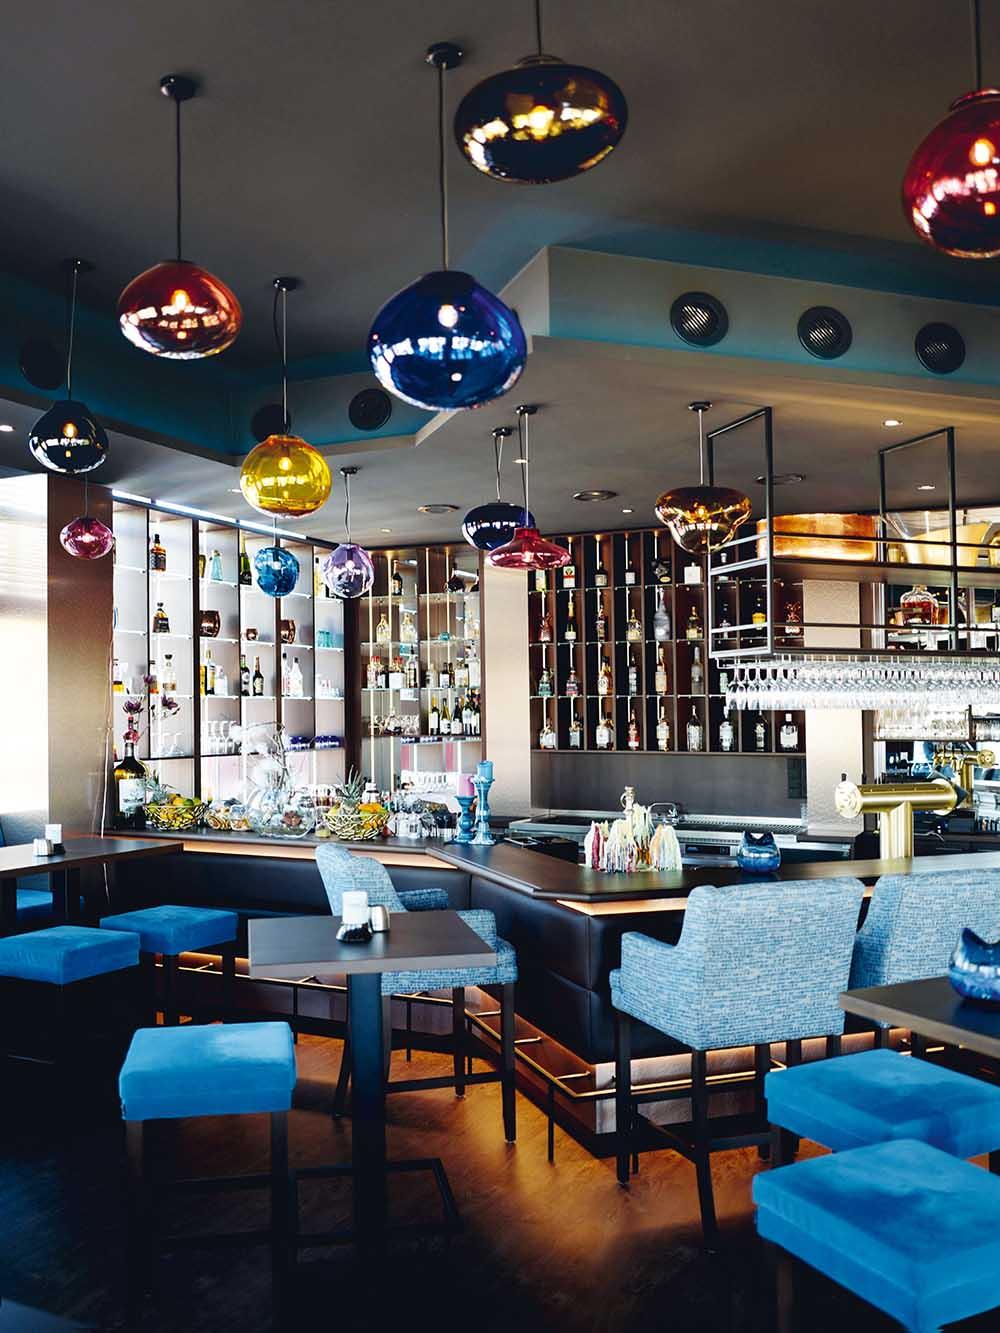 ELOA - Unique Lights Seaside Project_Restaurant&Bar_Seaside_photoby_Esther_Gummig_03_RGB_LR